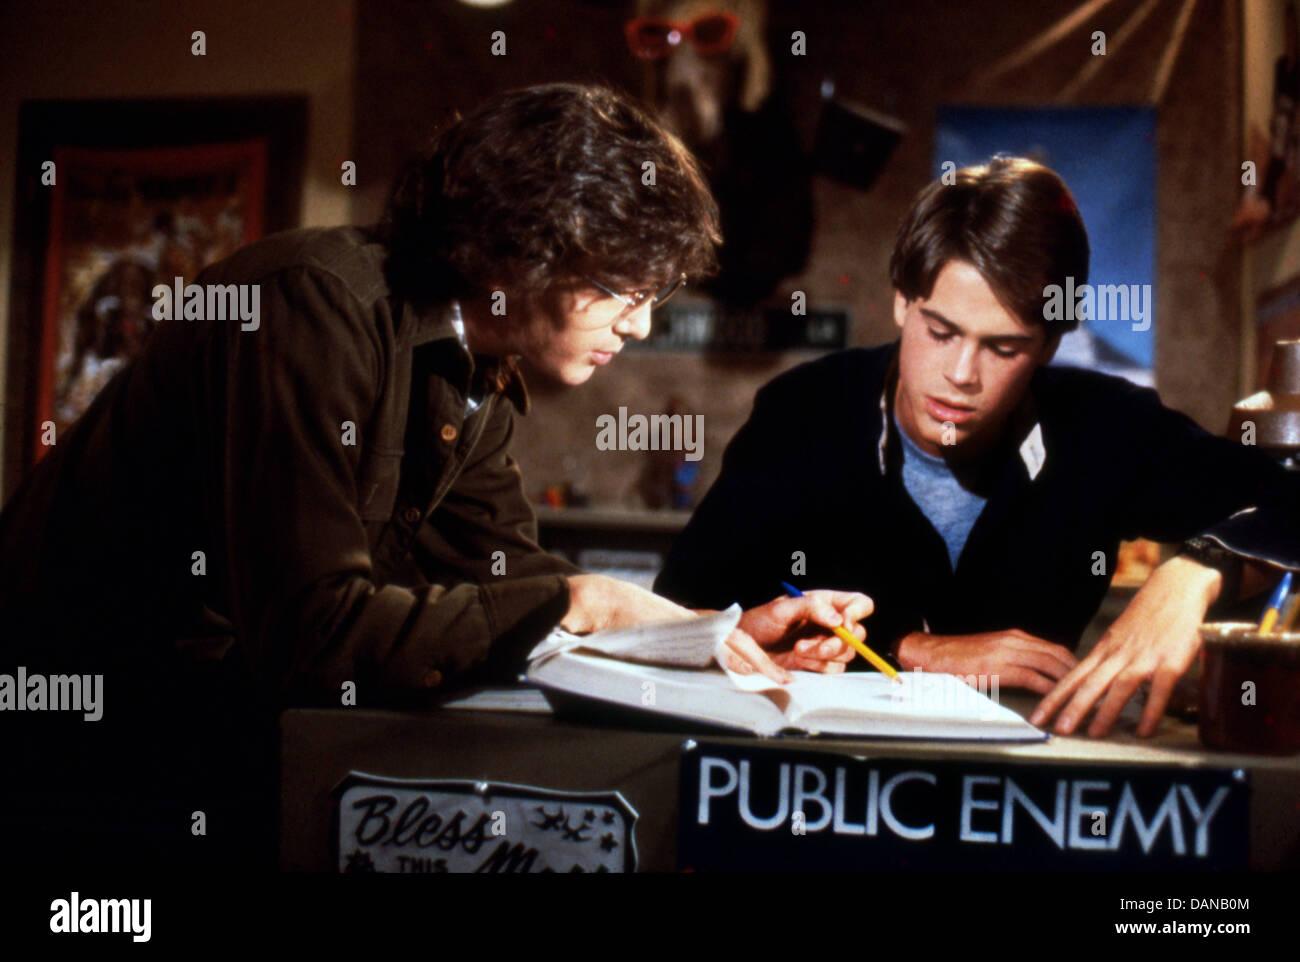 CLASS (1983) ANDREW MCCARTHY, ROB LOWE, LEWIS JOHN CARLINO (DIR) CLS 011 MOVIESTORE COLLECTION LTD - Stock Image